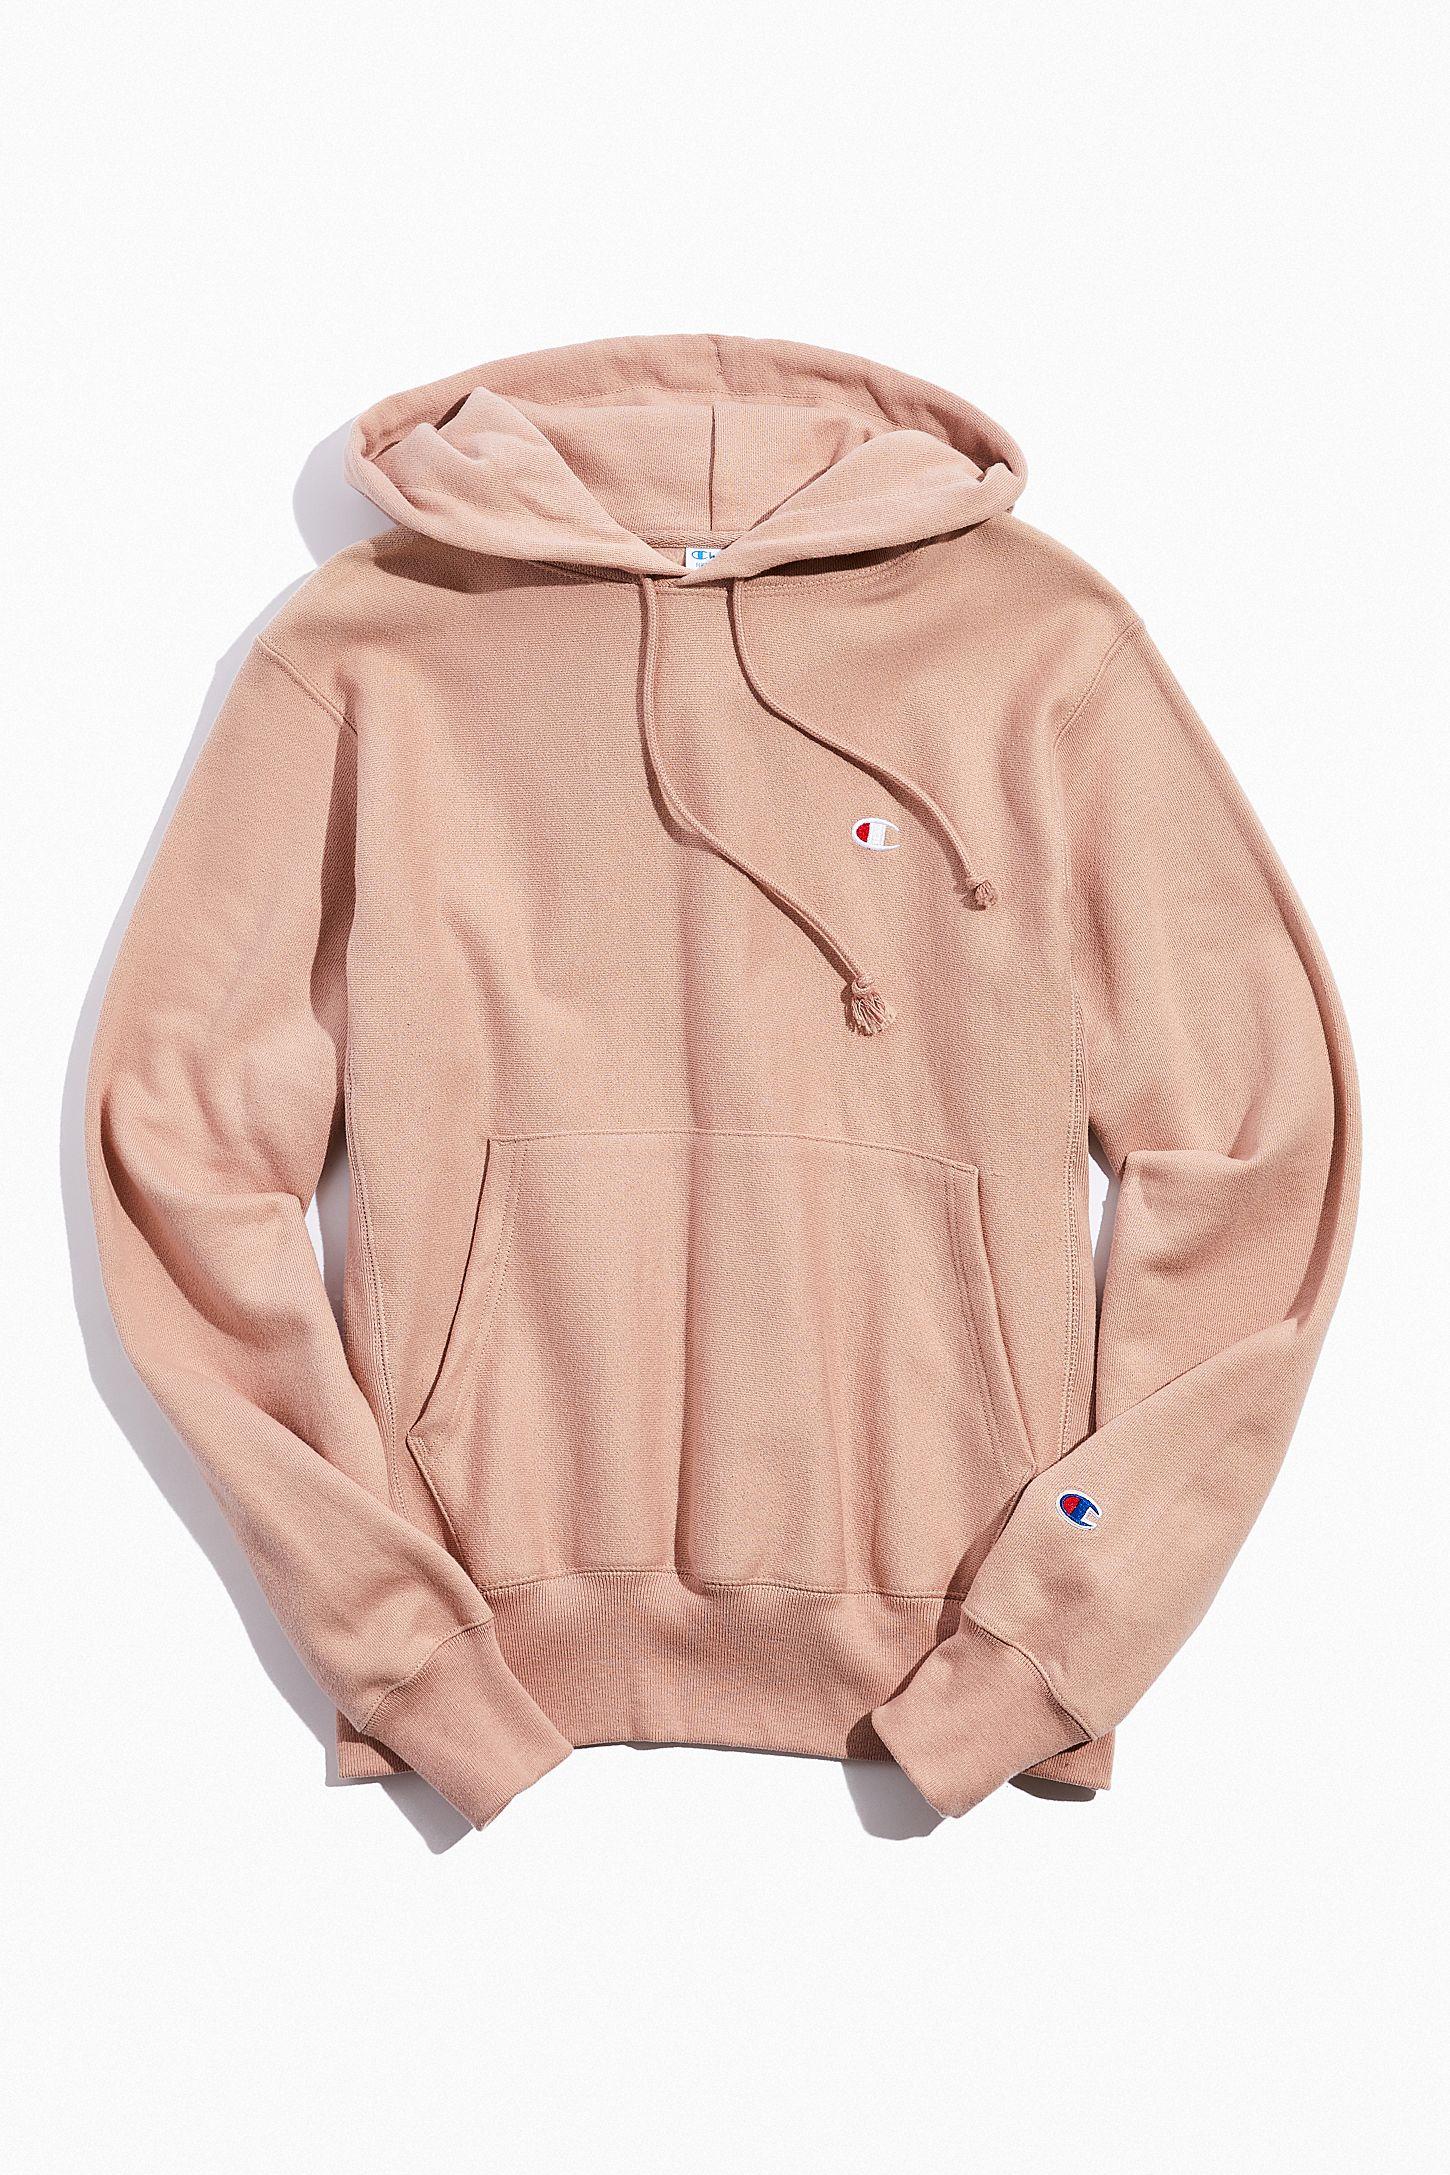 808da036bda9 Slide View  6  Champion Reverse Weave Hoodie Sweatshirt